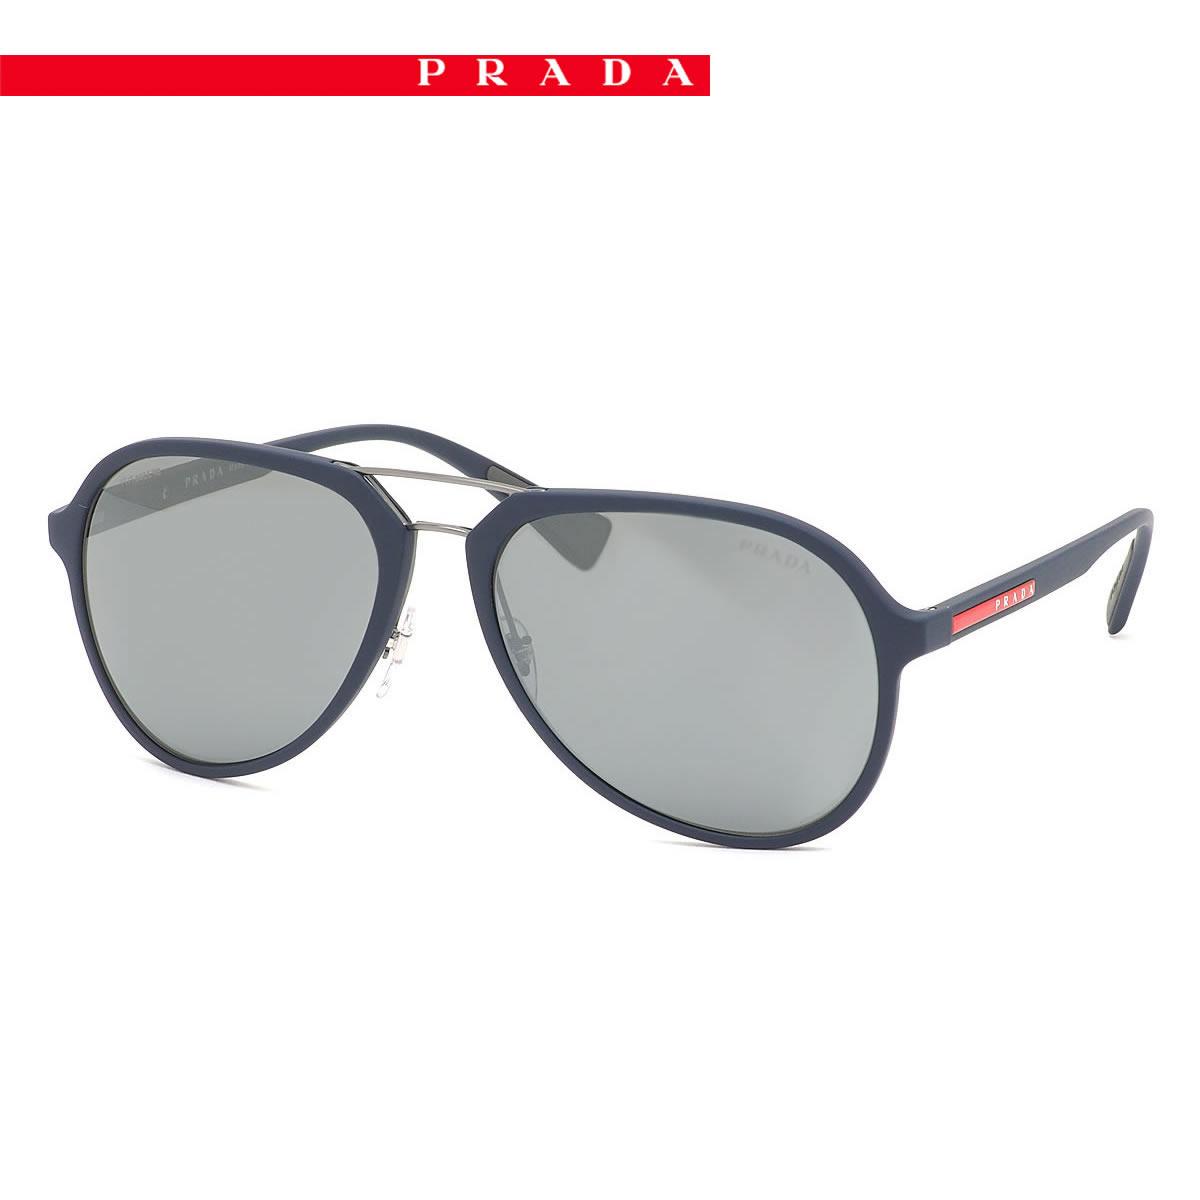 05b810441664 (PRADA SPORT) sunglasses PS05RS TFY7W1 58 size PRADA SPORTS リネアロッサ LINEA  ROSSA rubber frame ...